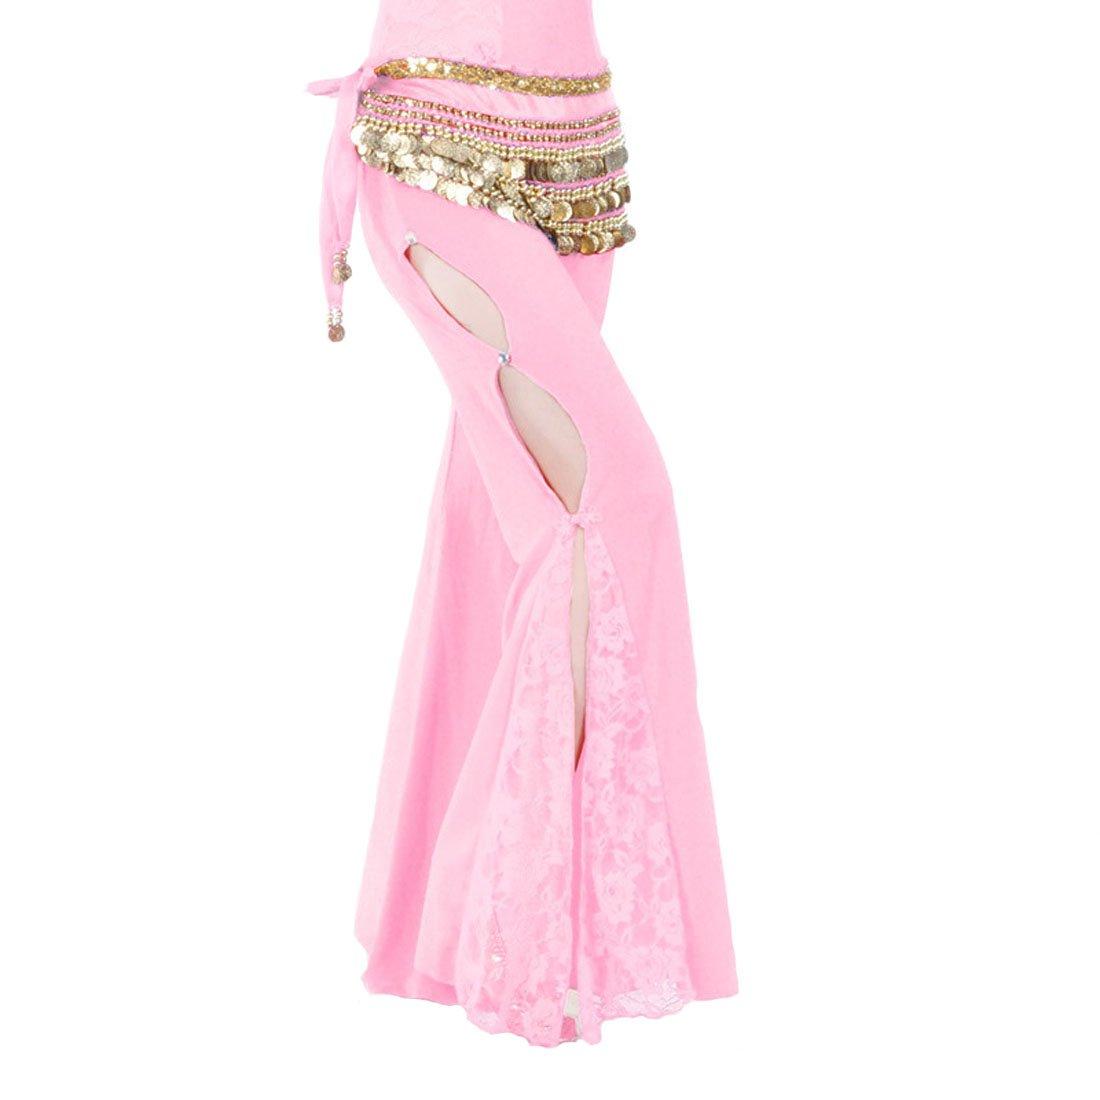 Calcifer Solid Lace Side Slits Belly Dance Pants Costume Dancewear For Women Professional Dancer